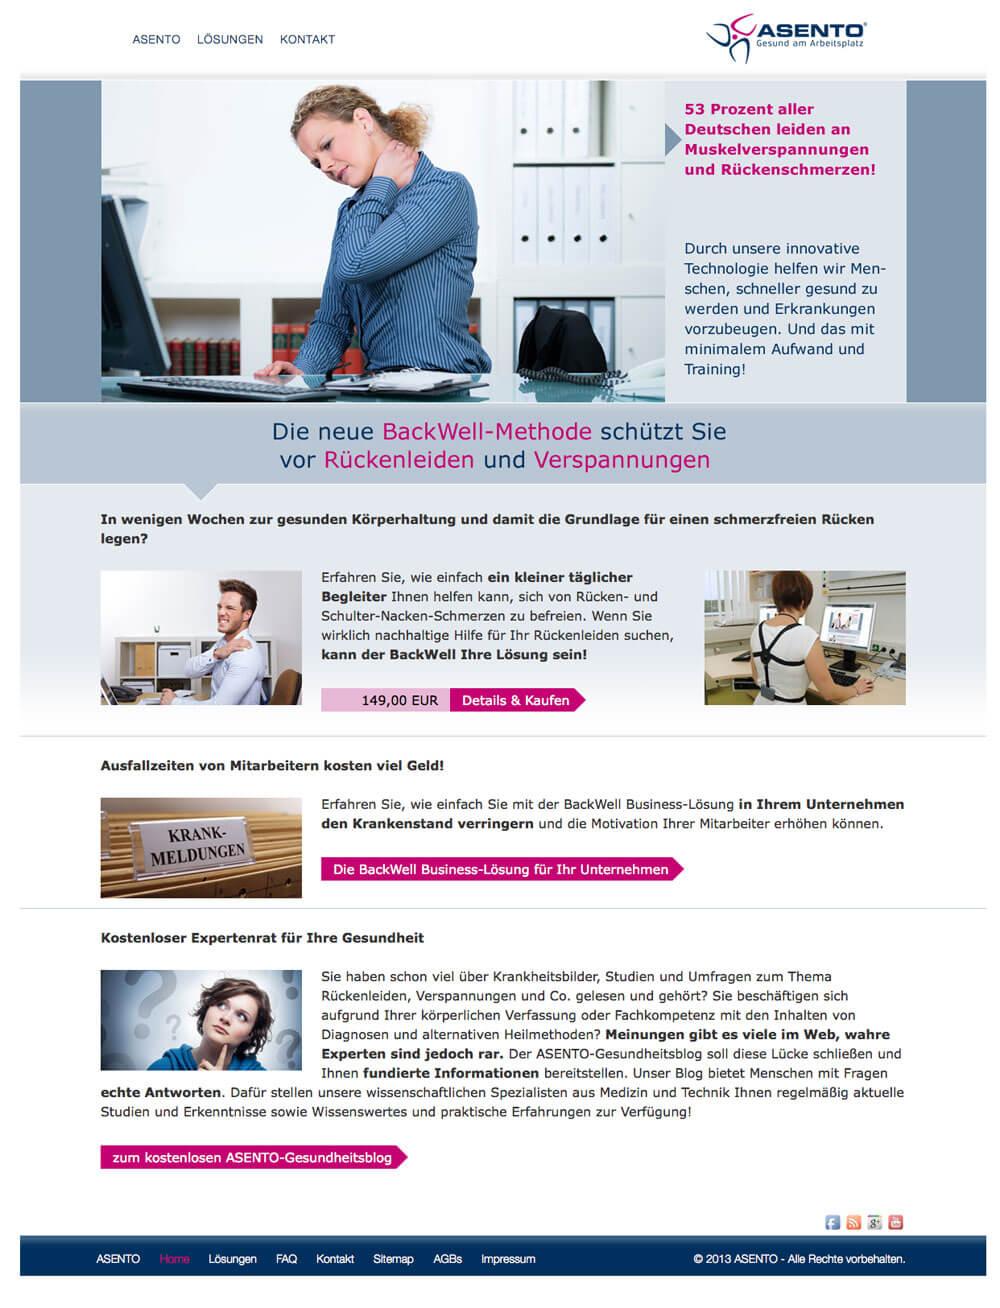 BackWell | ASENTO - Gesund am Arbeitsplatz